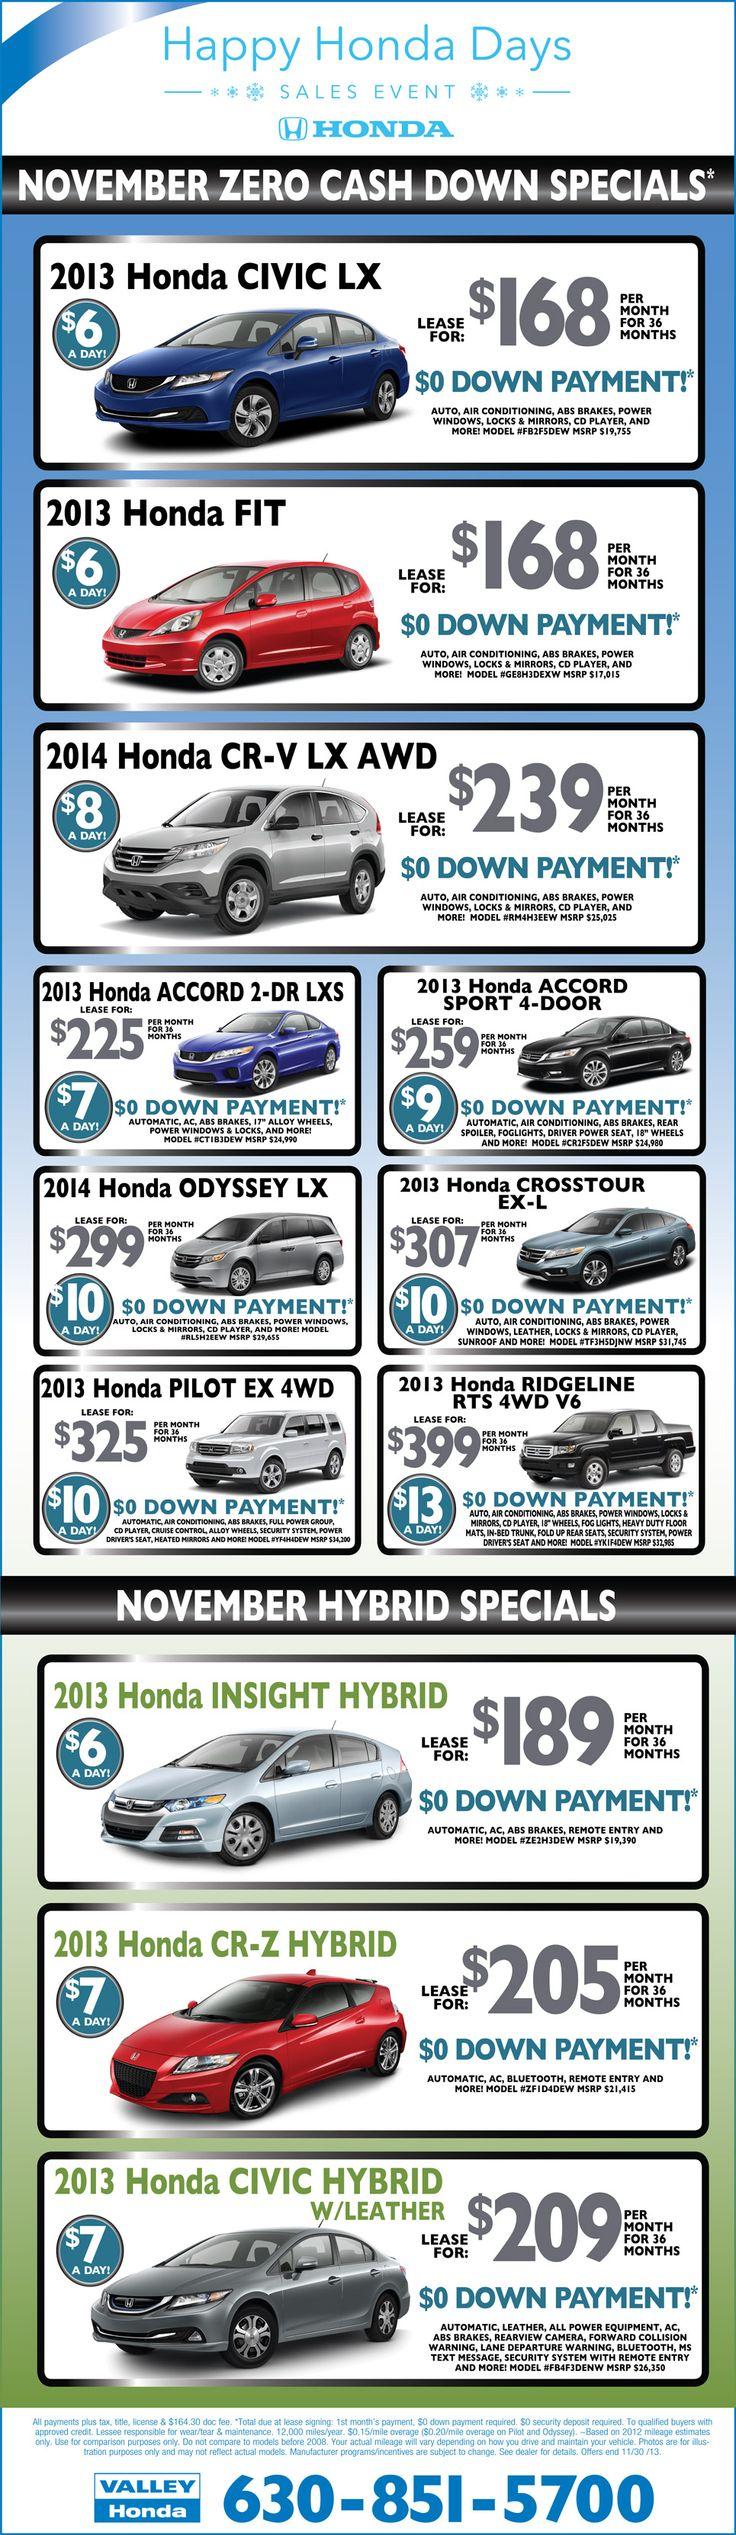 Happy Honda Days Lease Specials